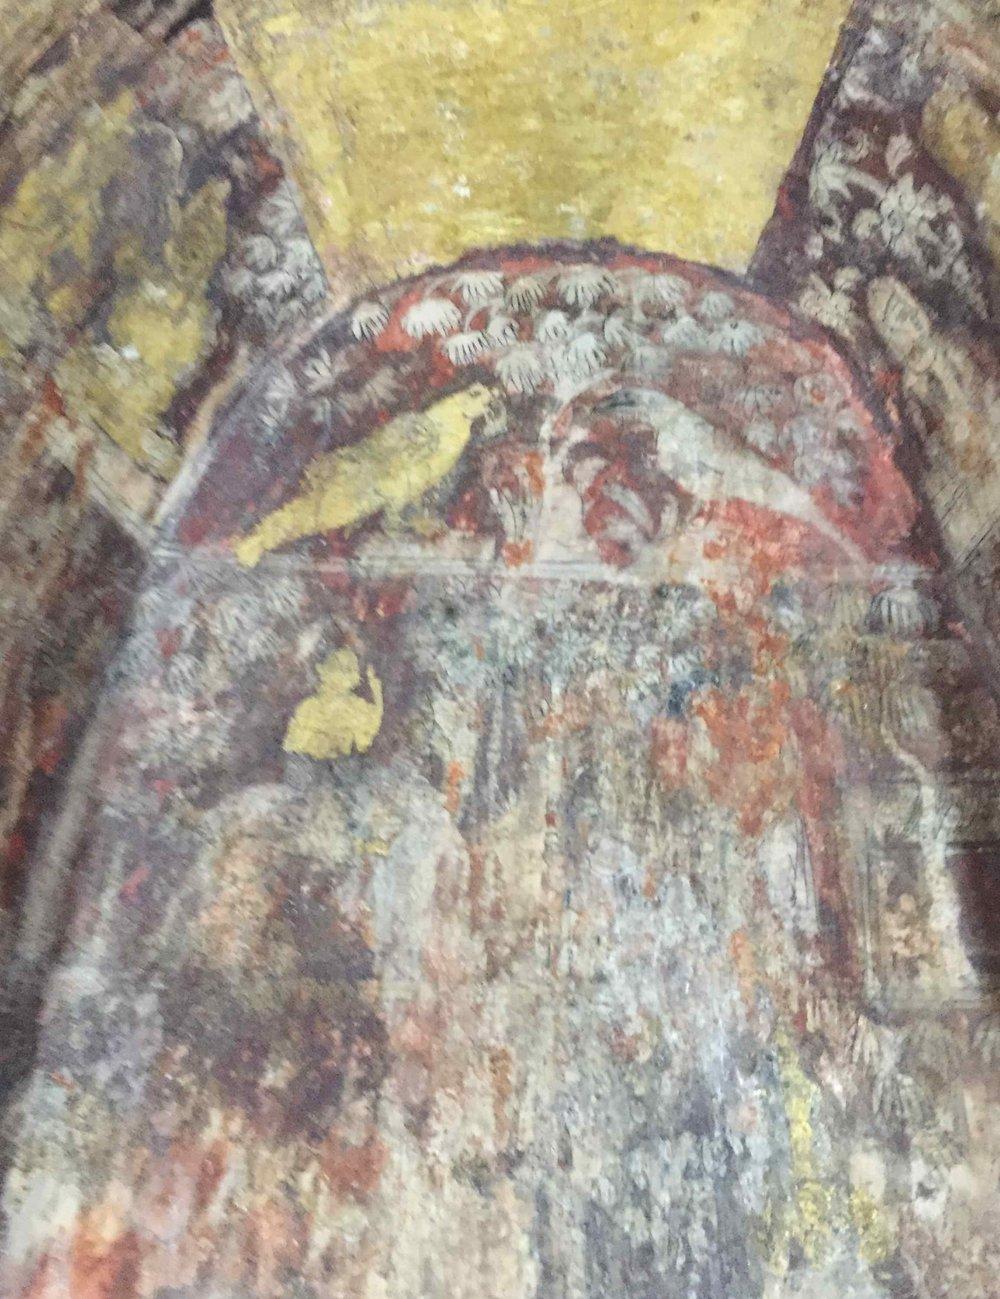 Wall paintings, Wat Ratchaburana crypt